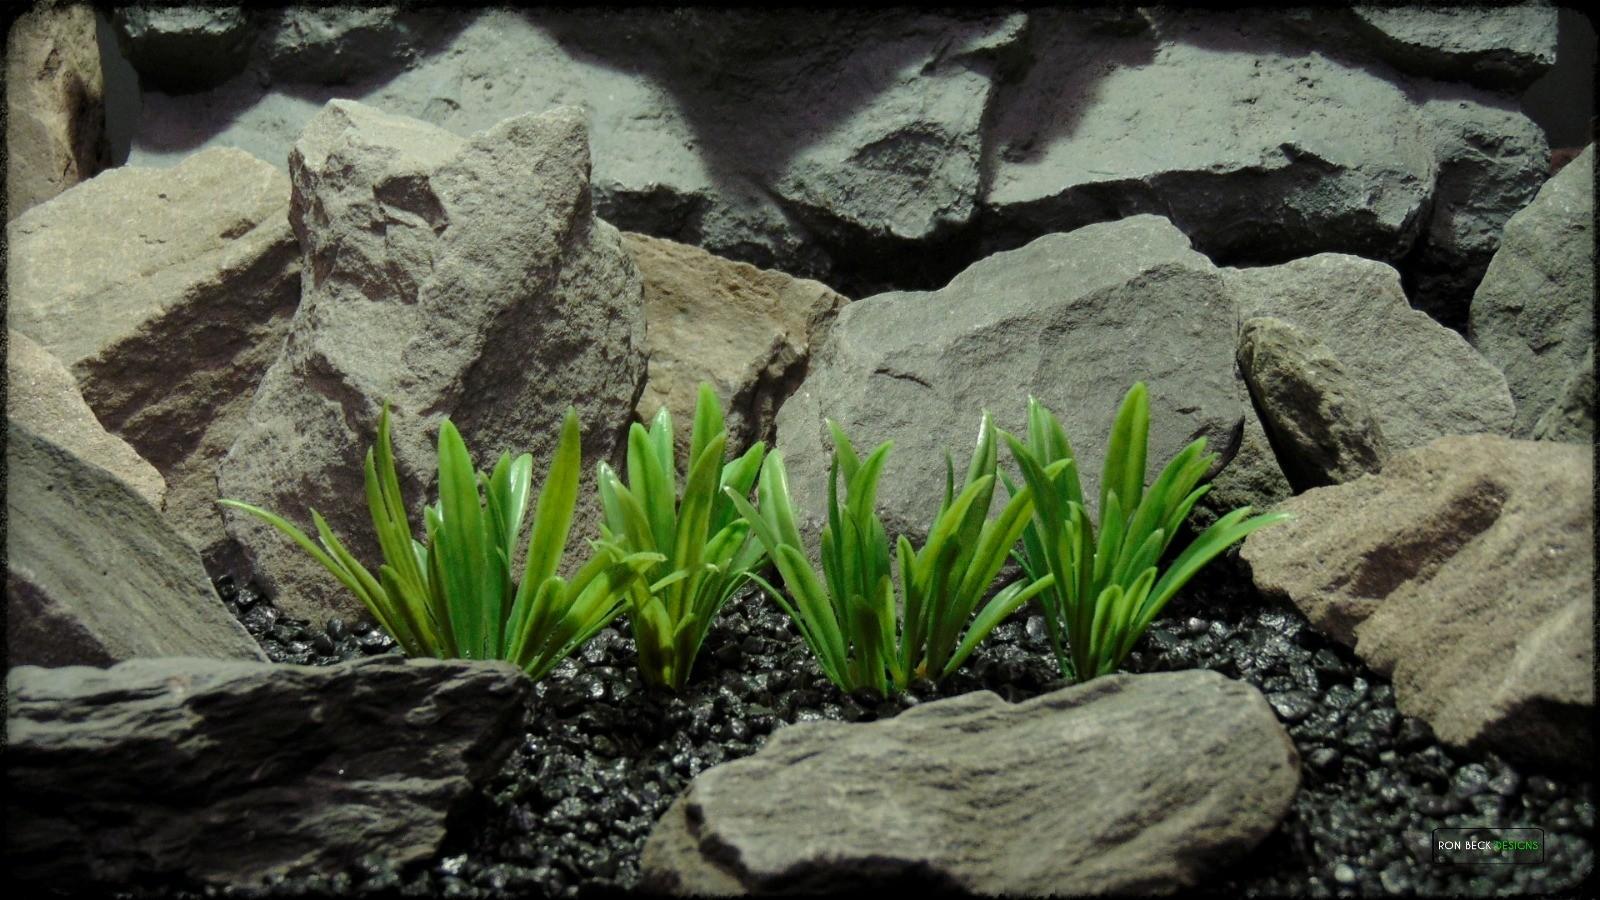 Artificial River Grass Plot - Artificial Aquarium Decor Plant - PARP387